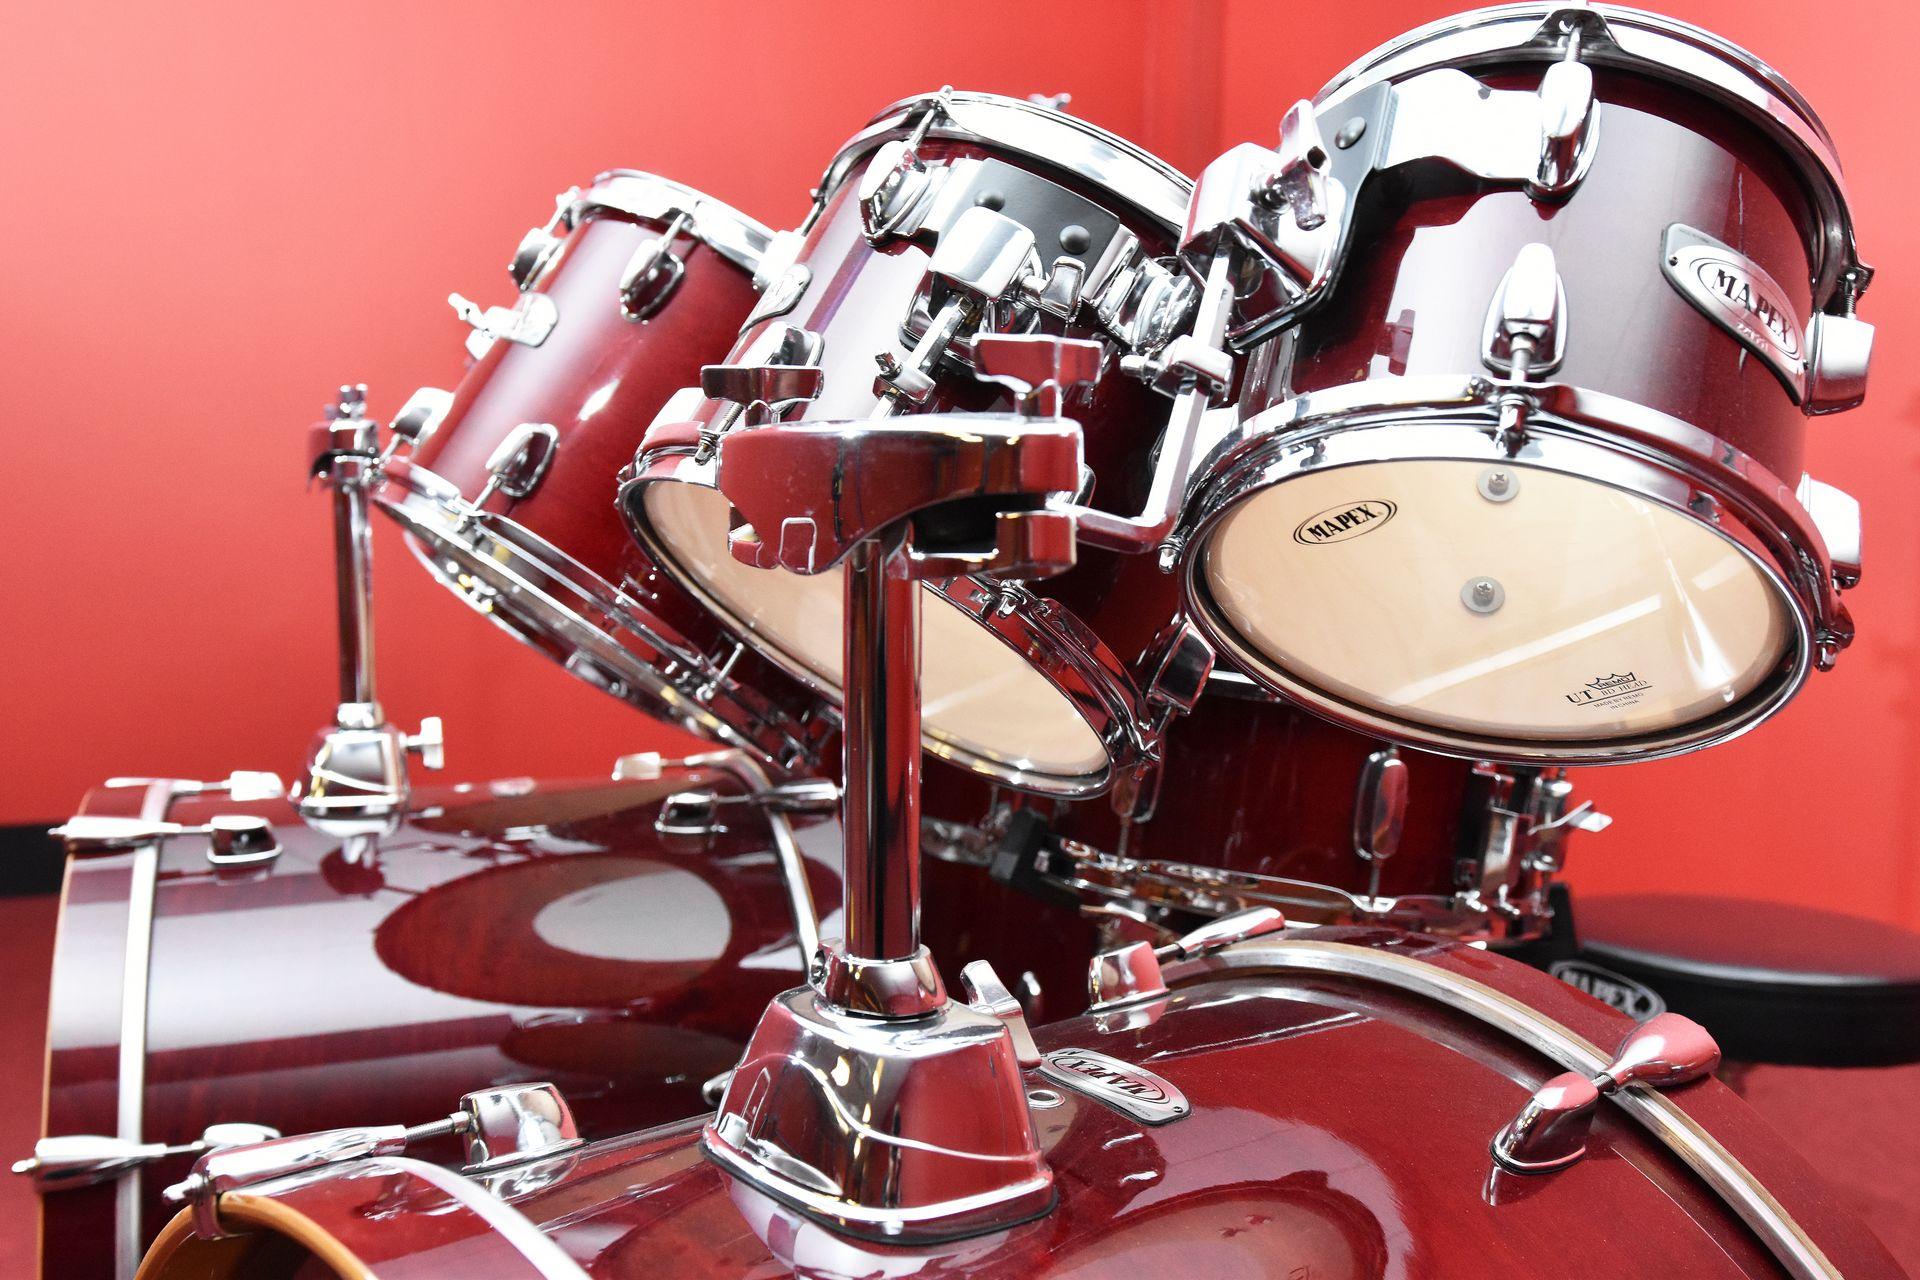 Mapex 9-piece drum kit for sale at Plasma Music